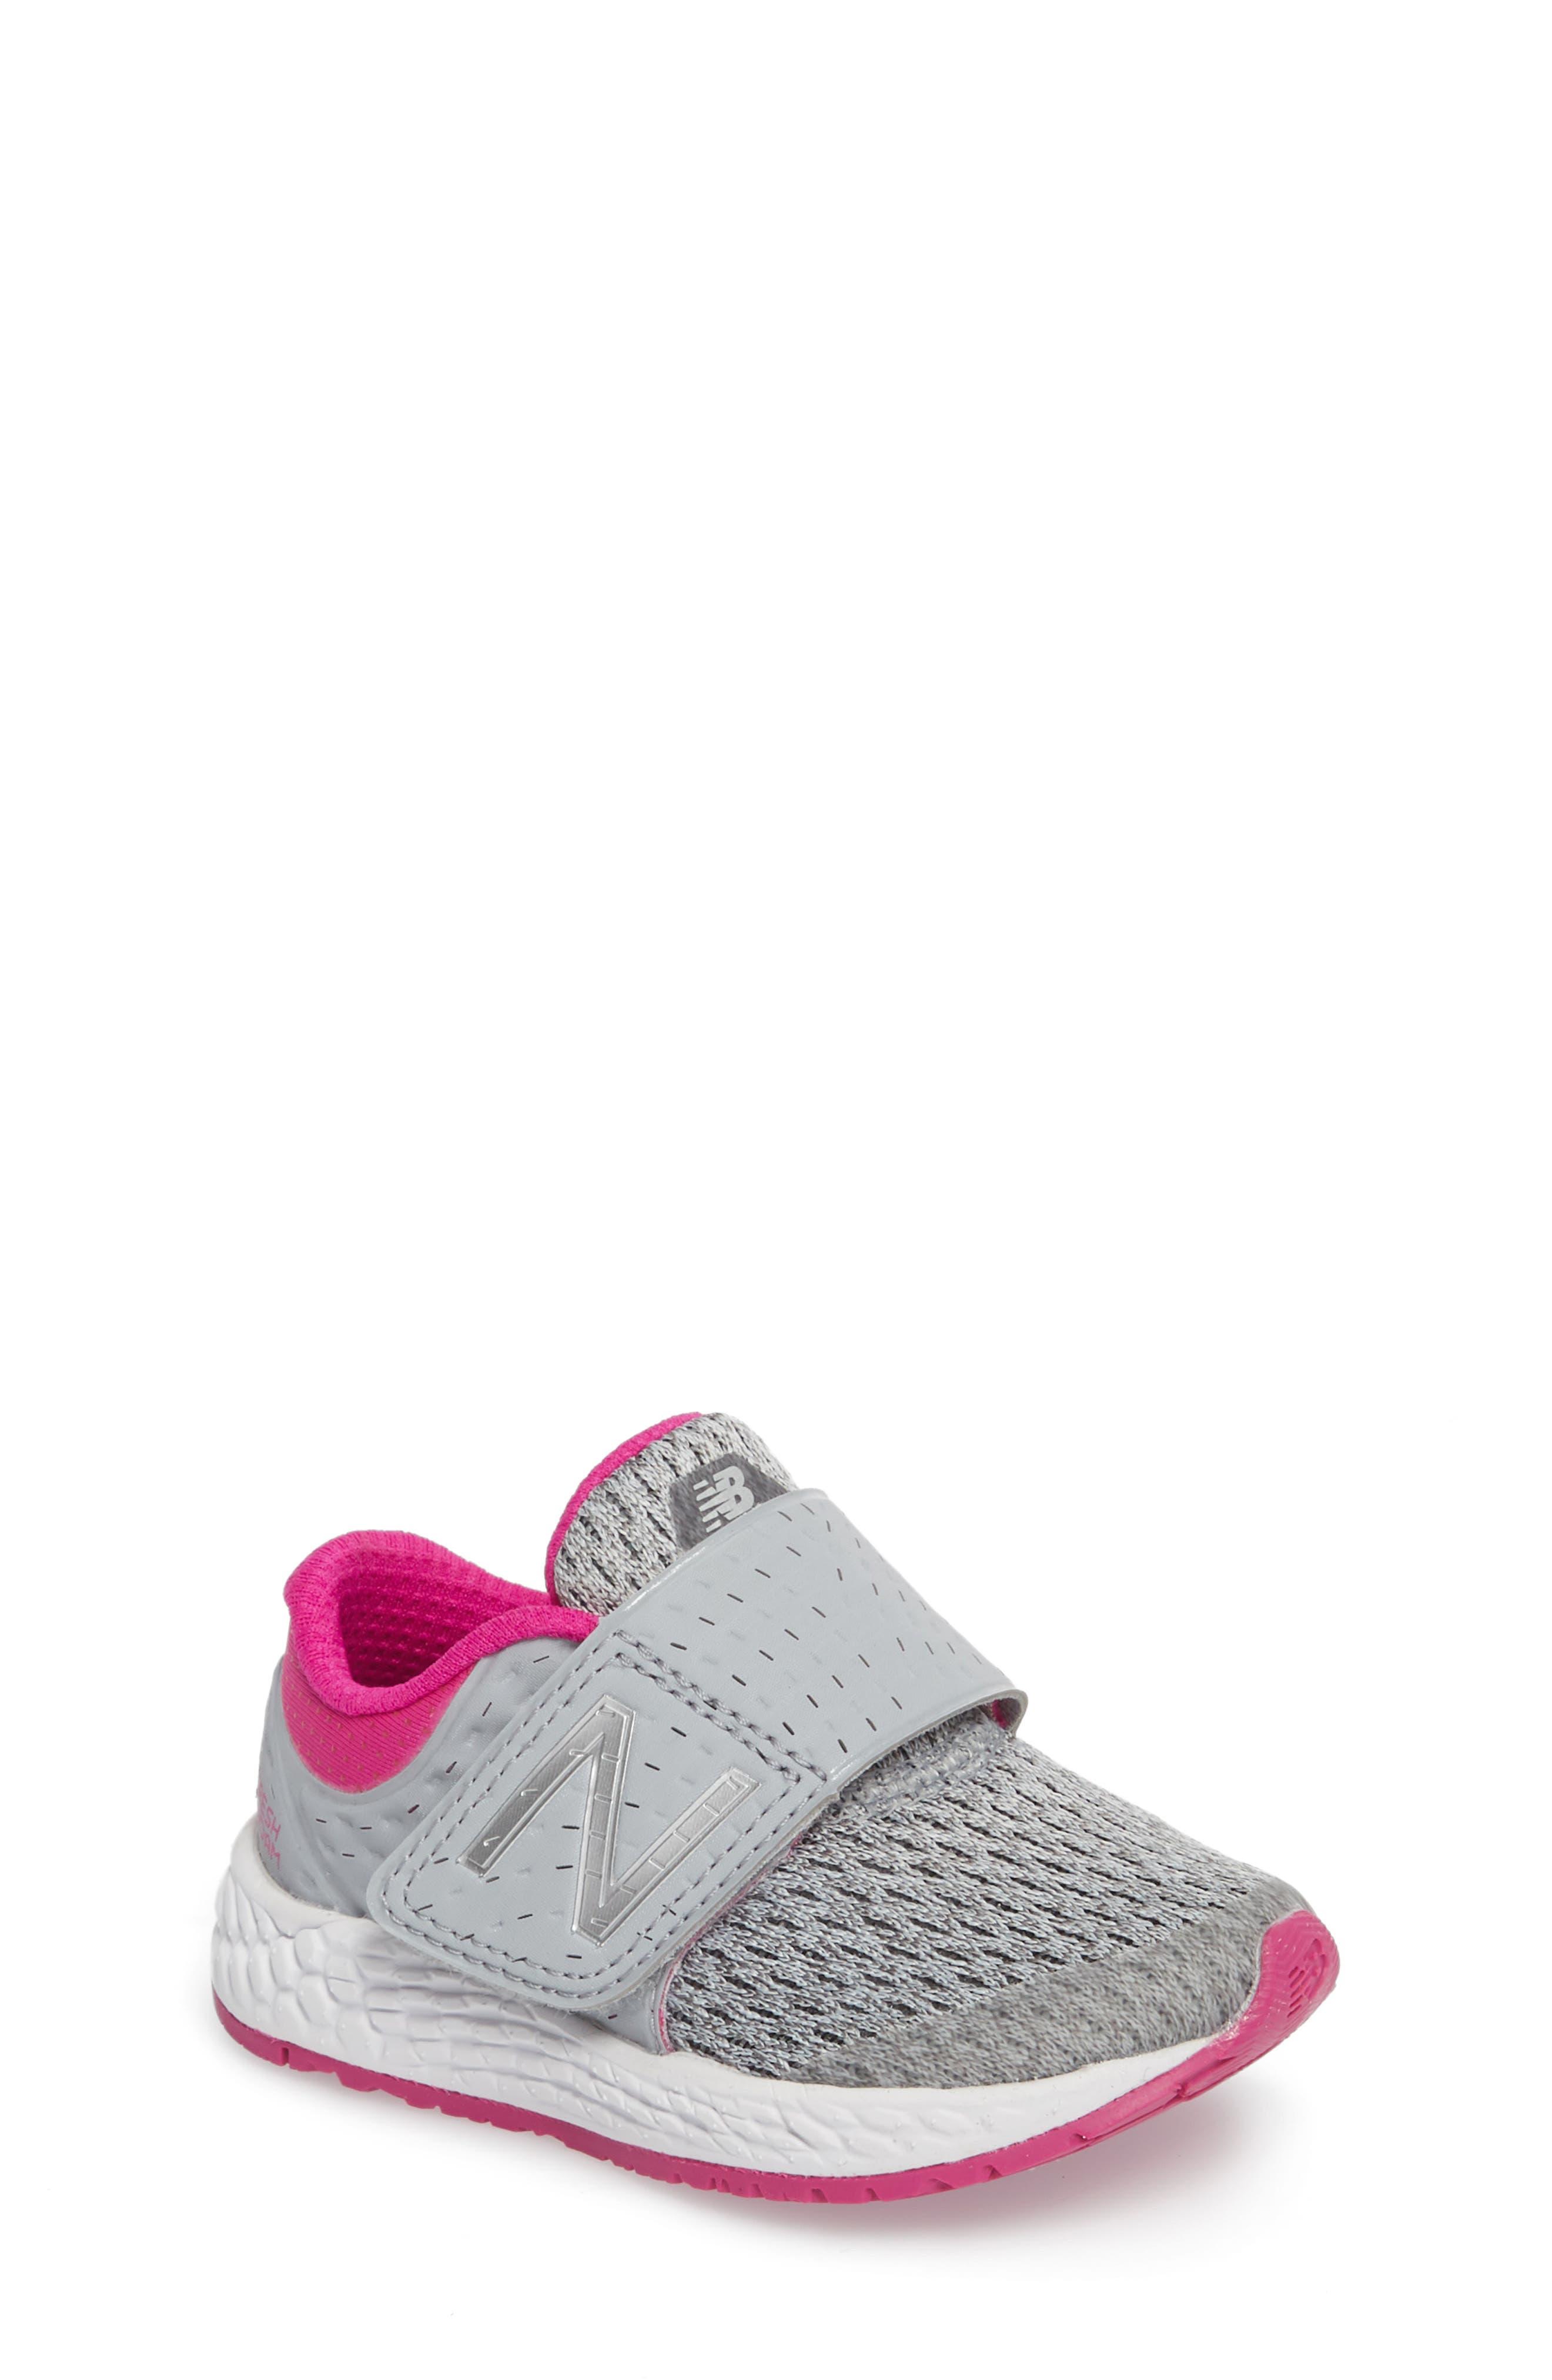 New Balance Fresh Foam Zante v4 Sneaker (Baby, Walker, Toddler, Little Kid & Big Kid)